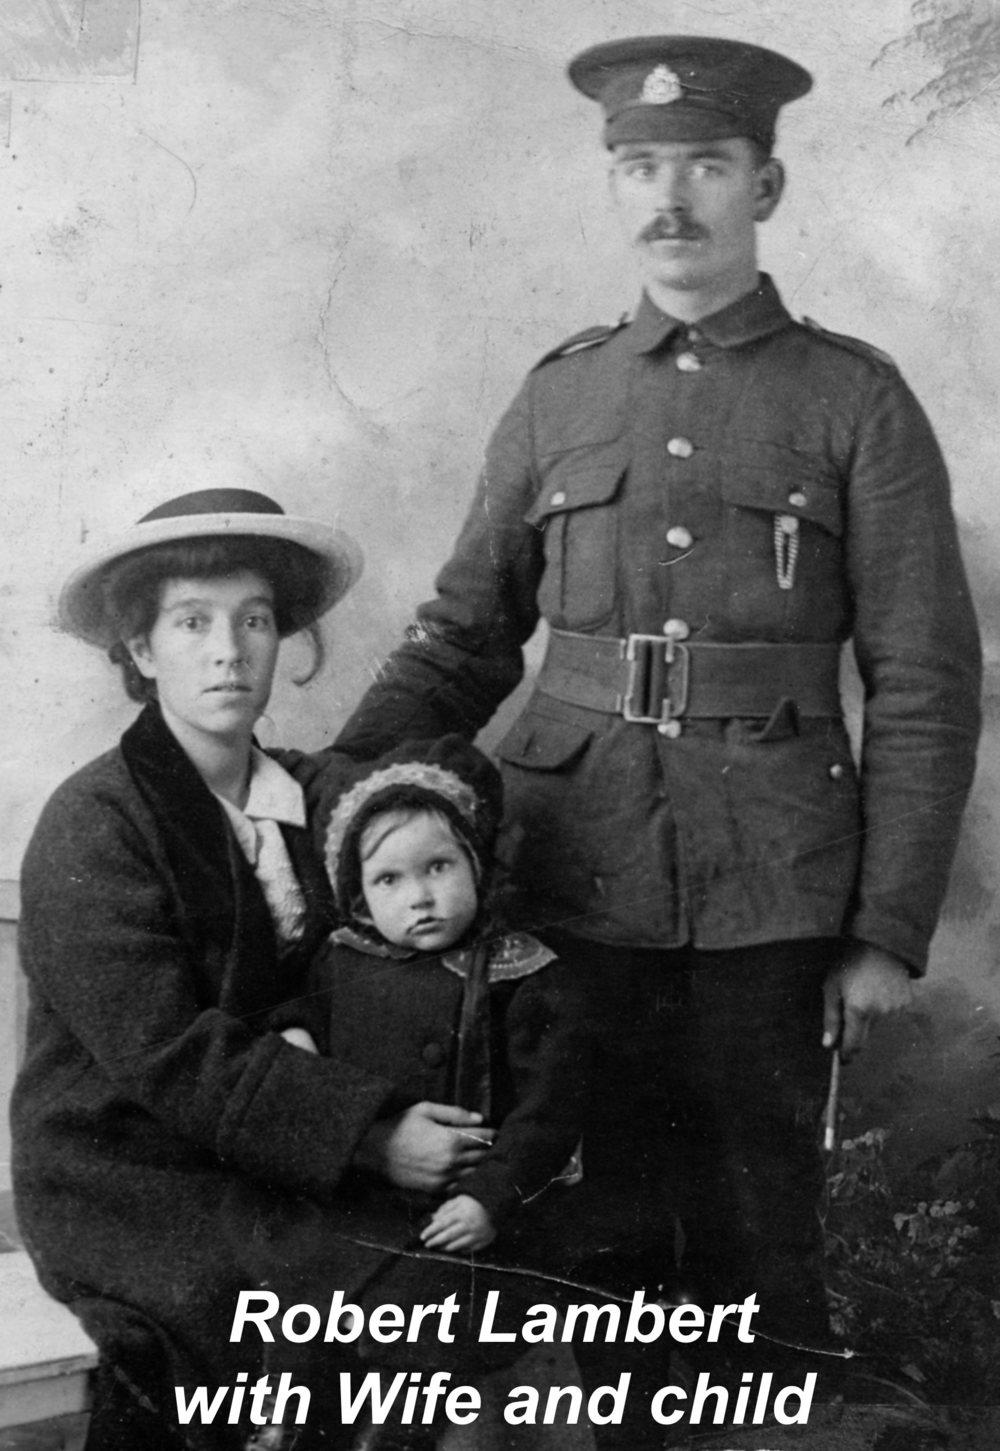 Robert Lambert, wife Lucy Maria Lambert (nee Leeks) with daughter Edith copy 2.jpg